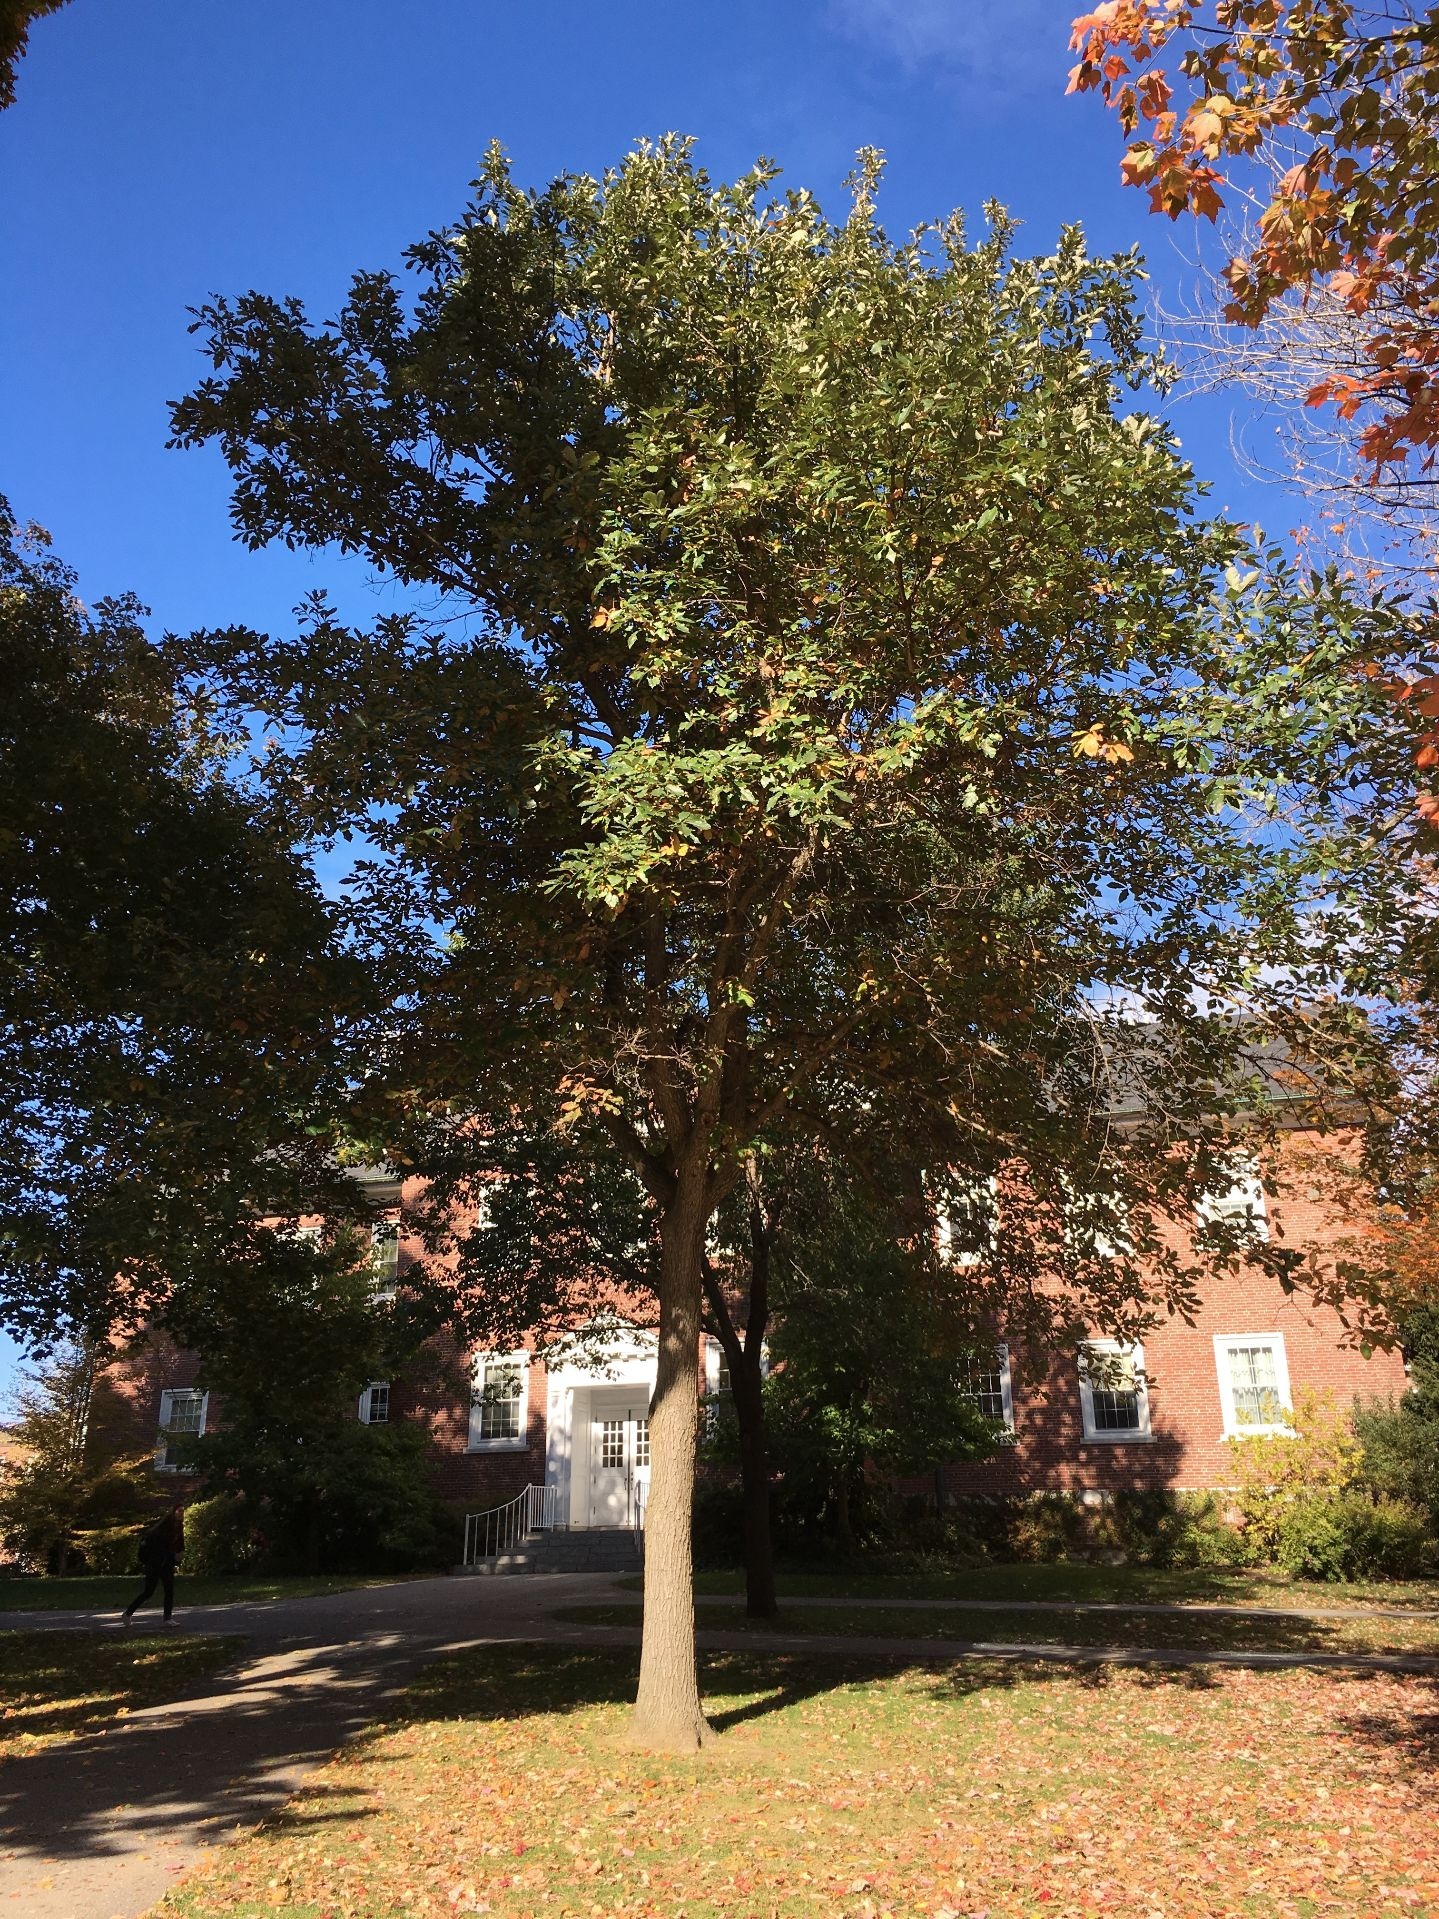 Swamp White Oak Bates Canopy Bates College